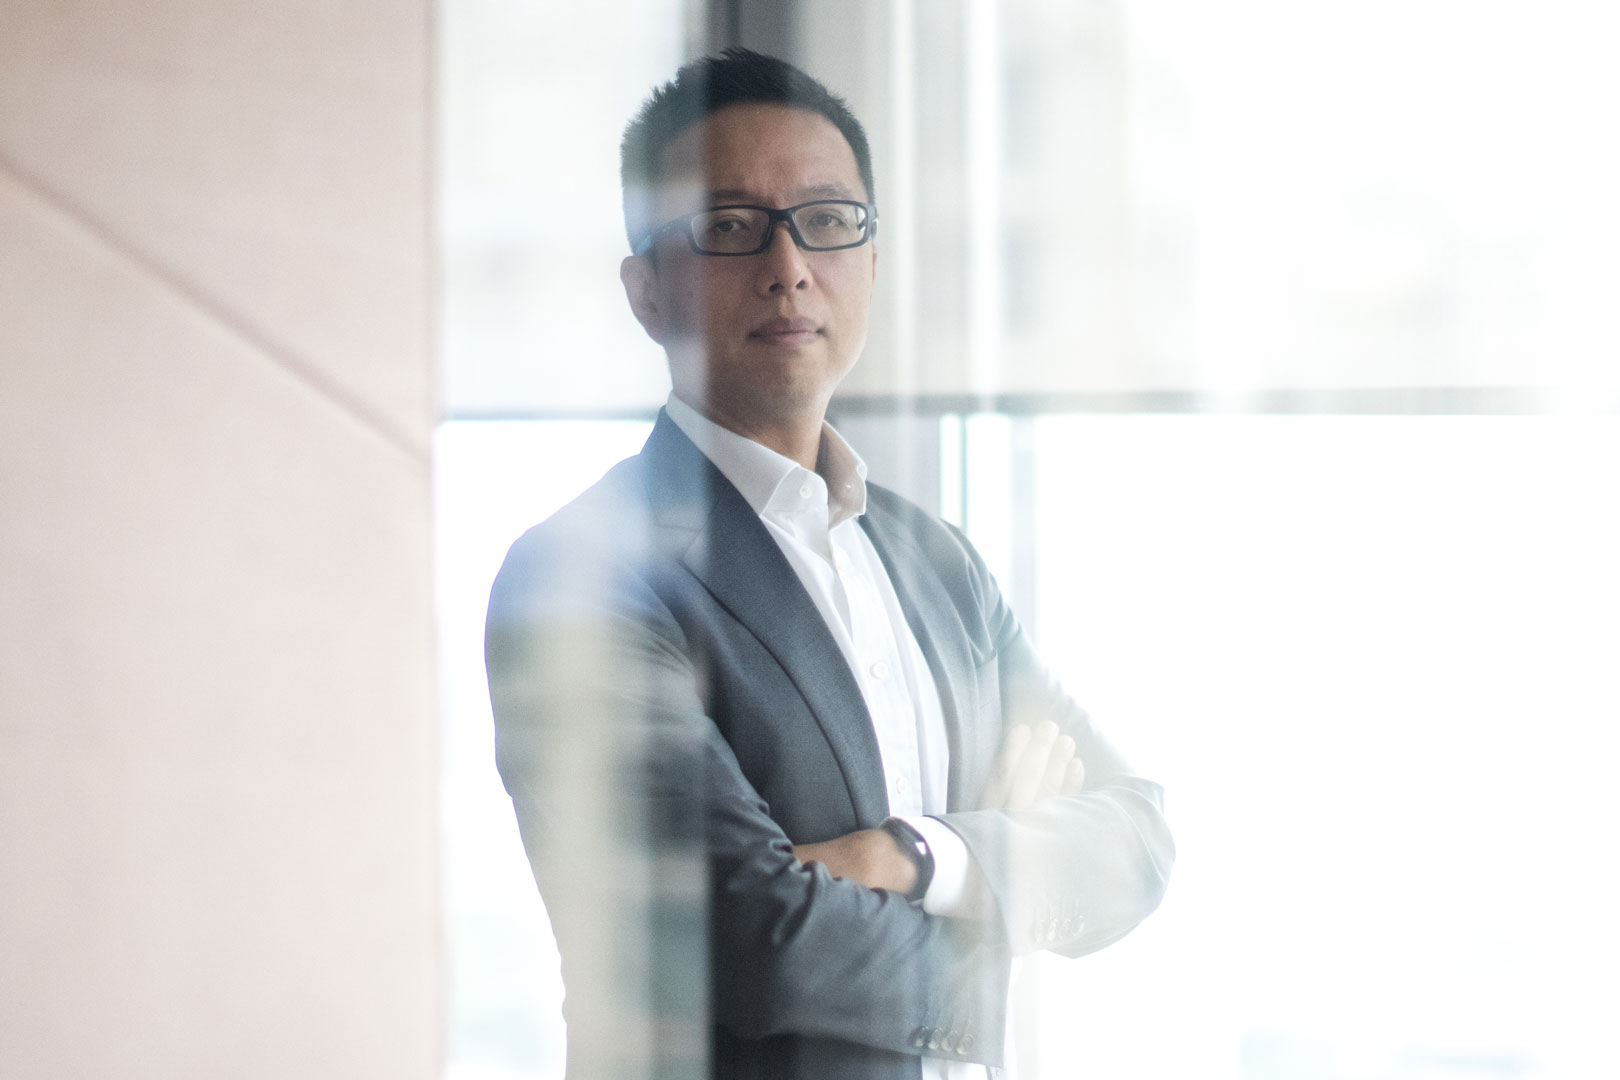 McKinsey's Kevin Wei Wang